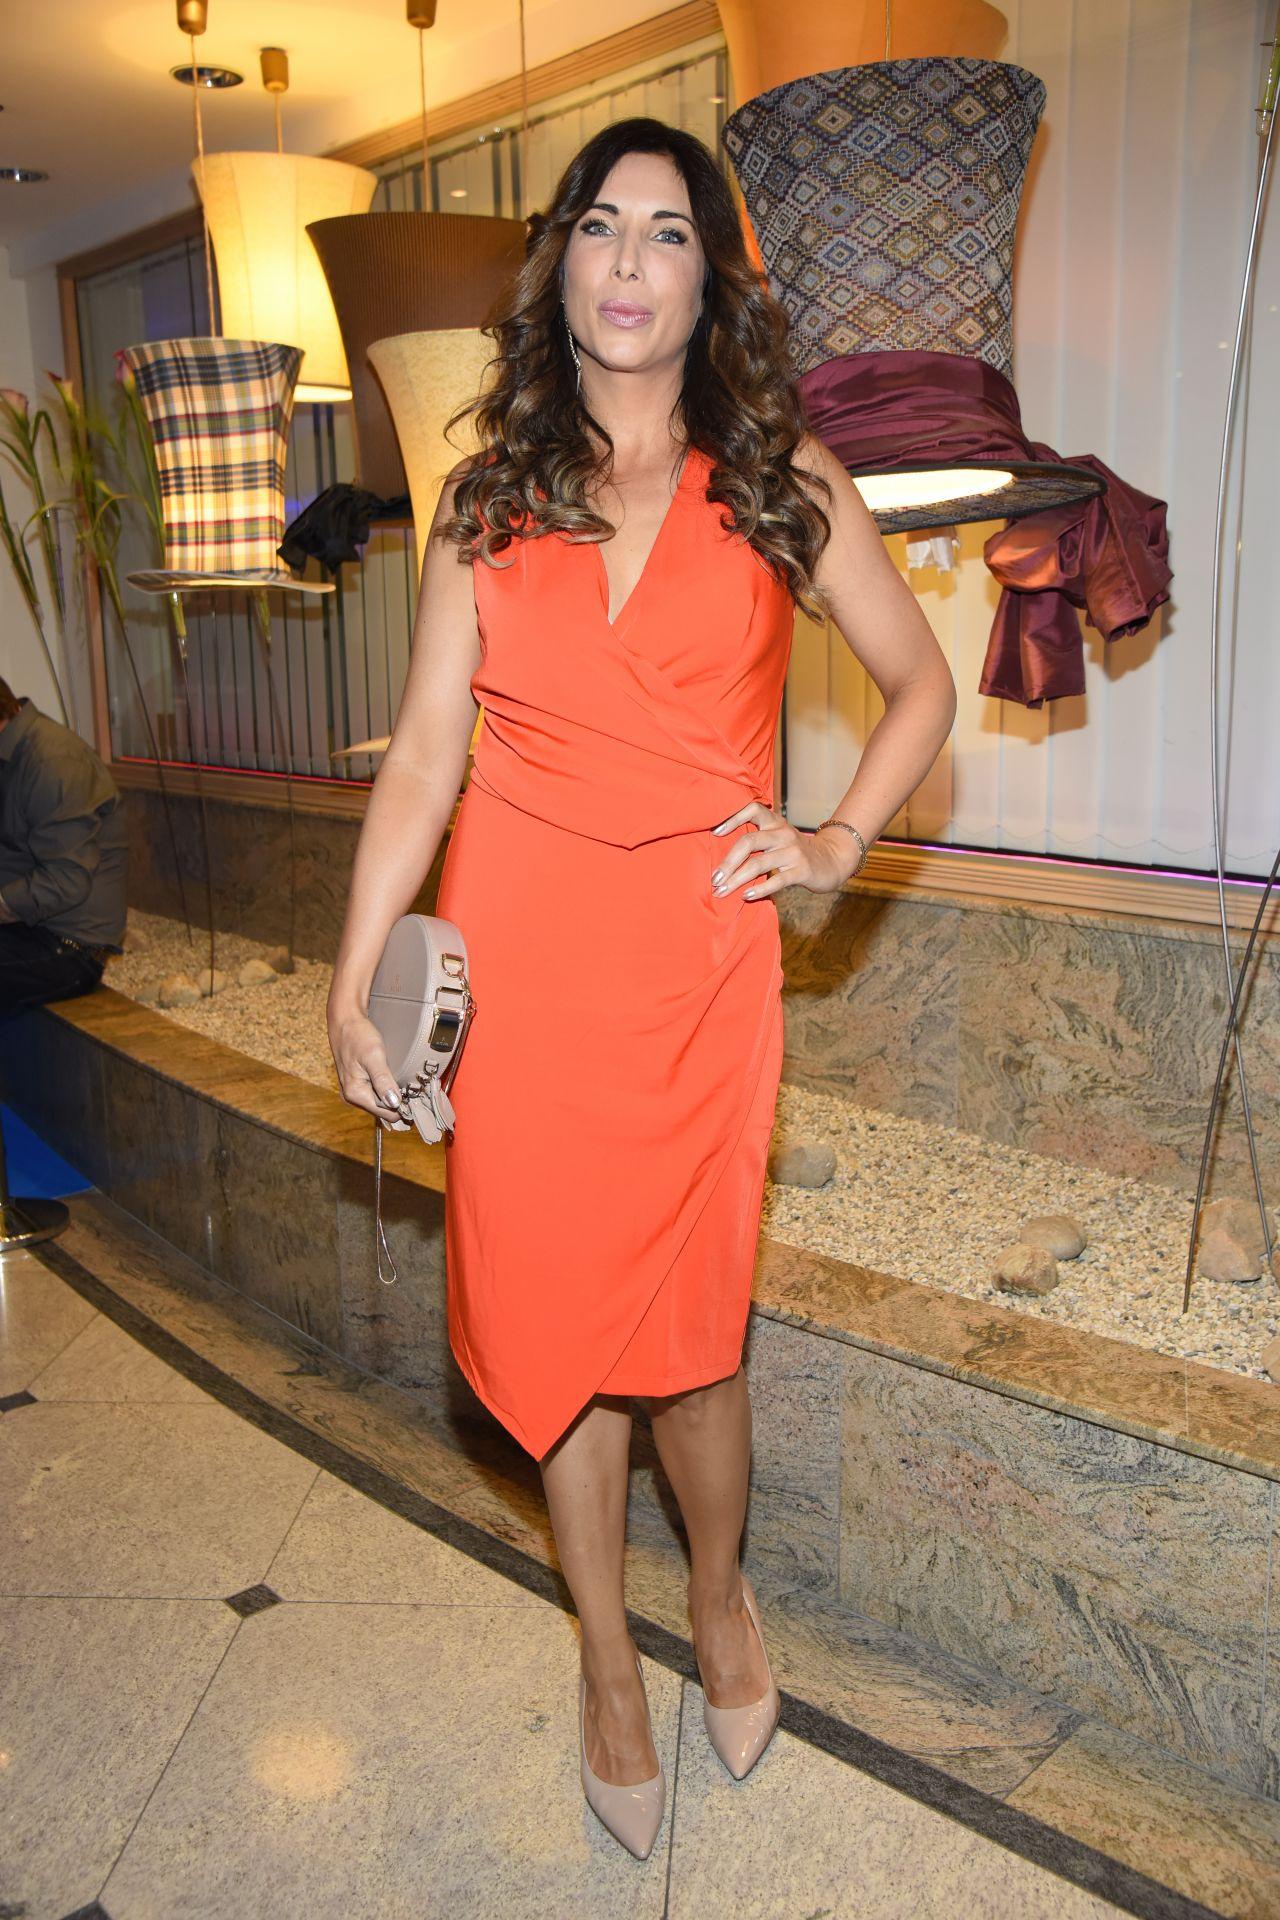 Alexandra polzin spa diamond award 2019 in hotel palace berlin naked (78 photo), Selfie Celebrity pictures